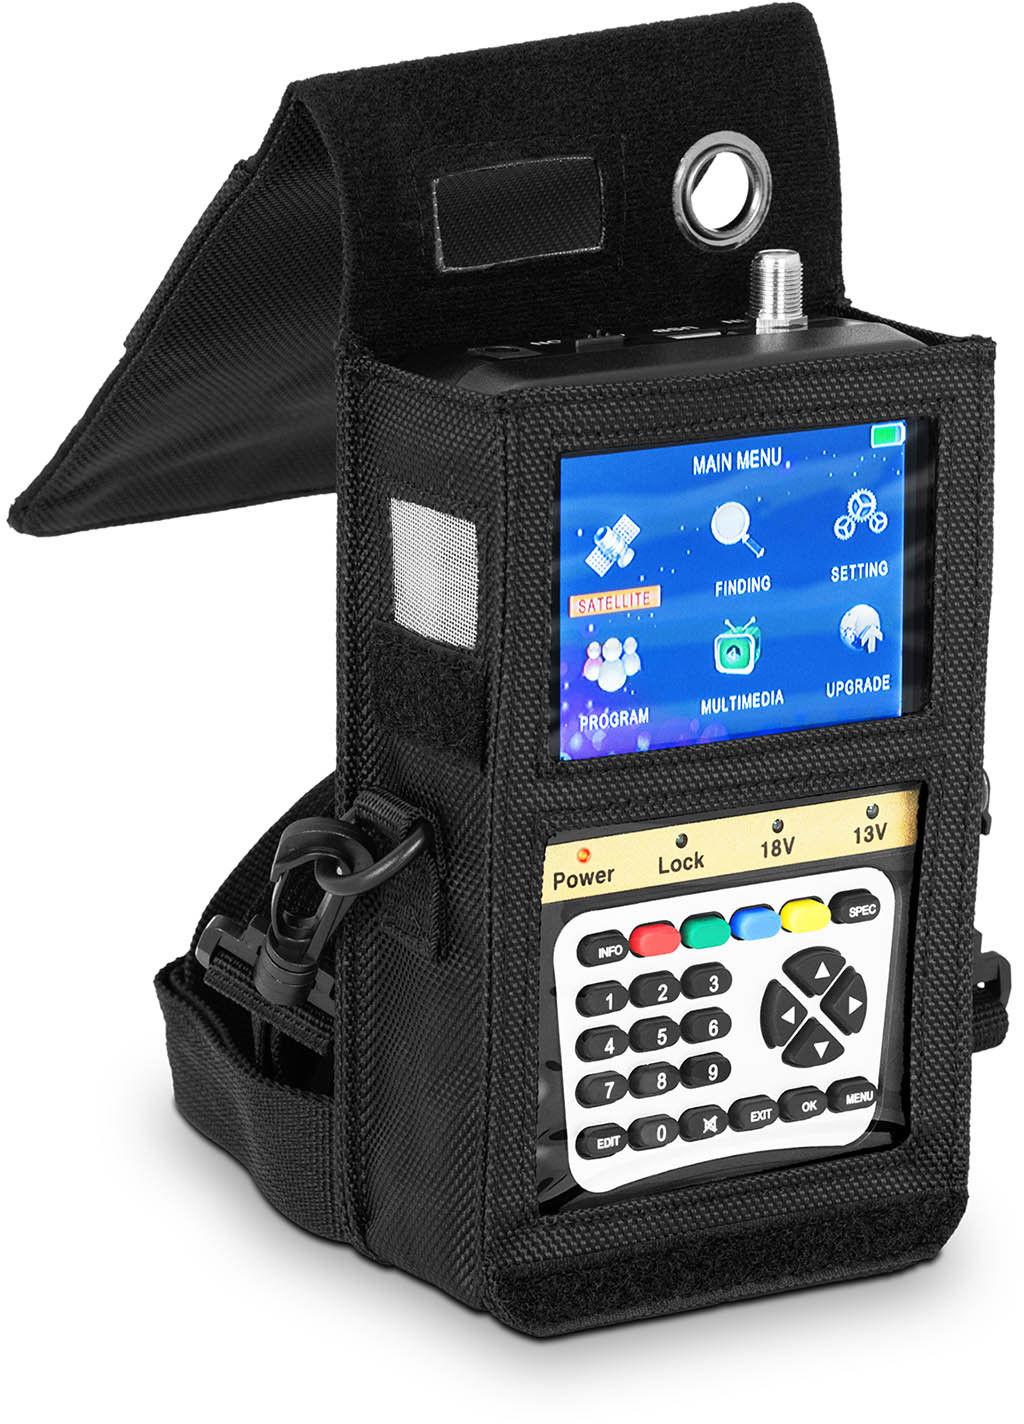 Miernik sygnału satelitarnego - DVB-S2 - DiSEqC 1.0-1.3 - Steinberg Systems - SBS-SF-2000 - 3 lata gwarancji/wysyłka w 24h